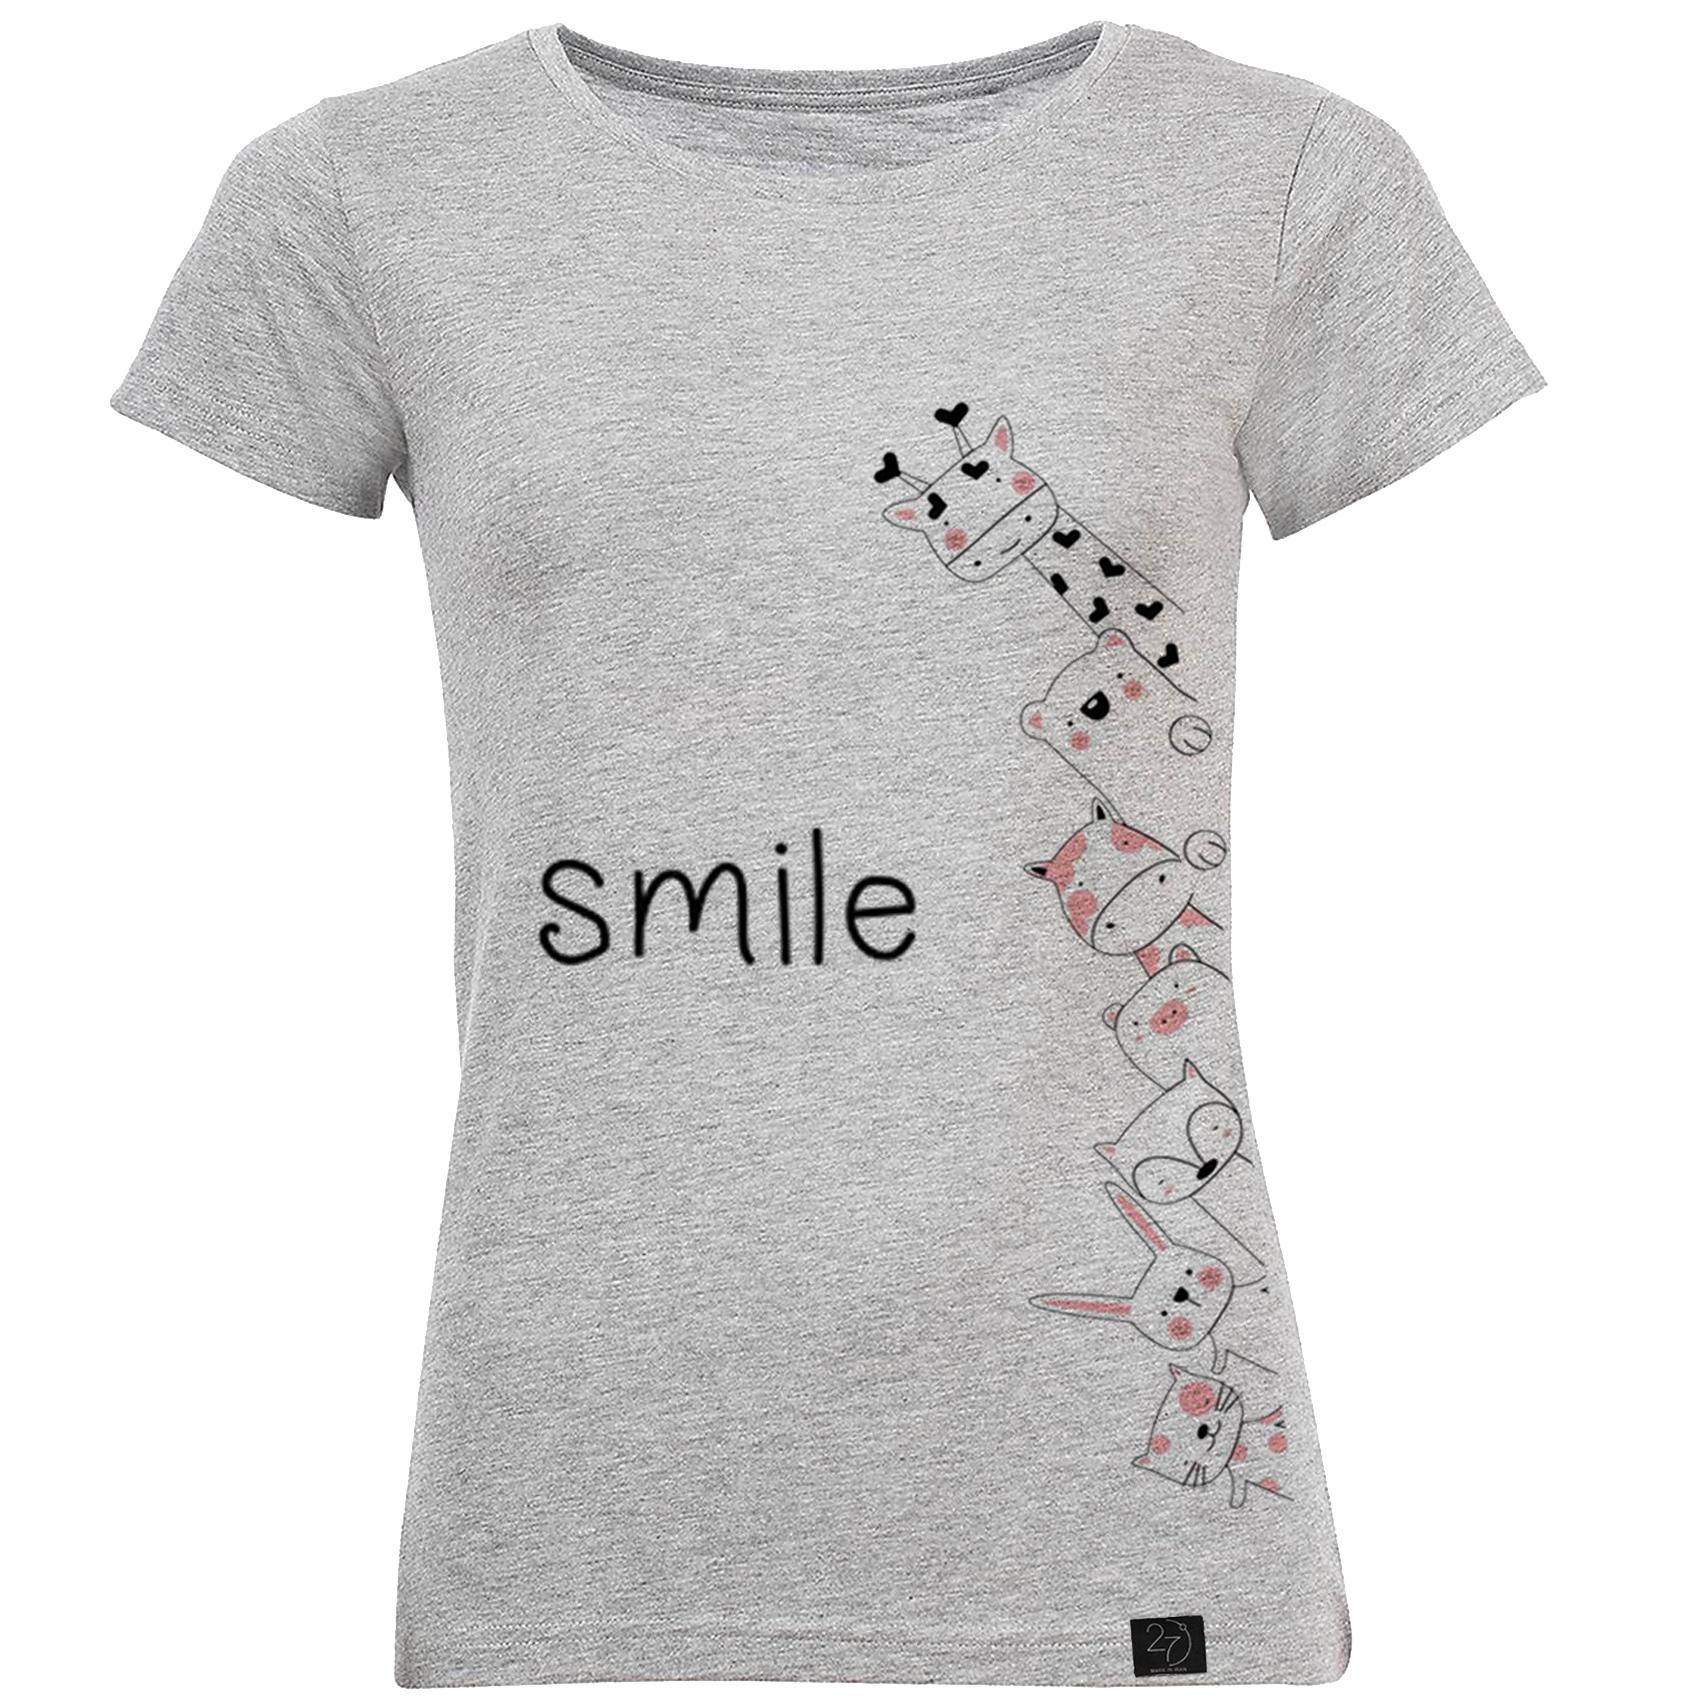 تیشرت زنانه 27 طرح SMILE کد M214